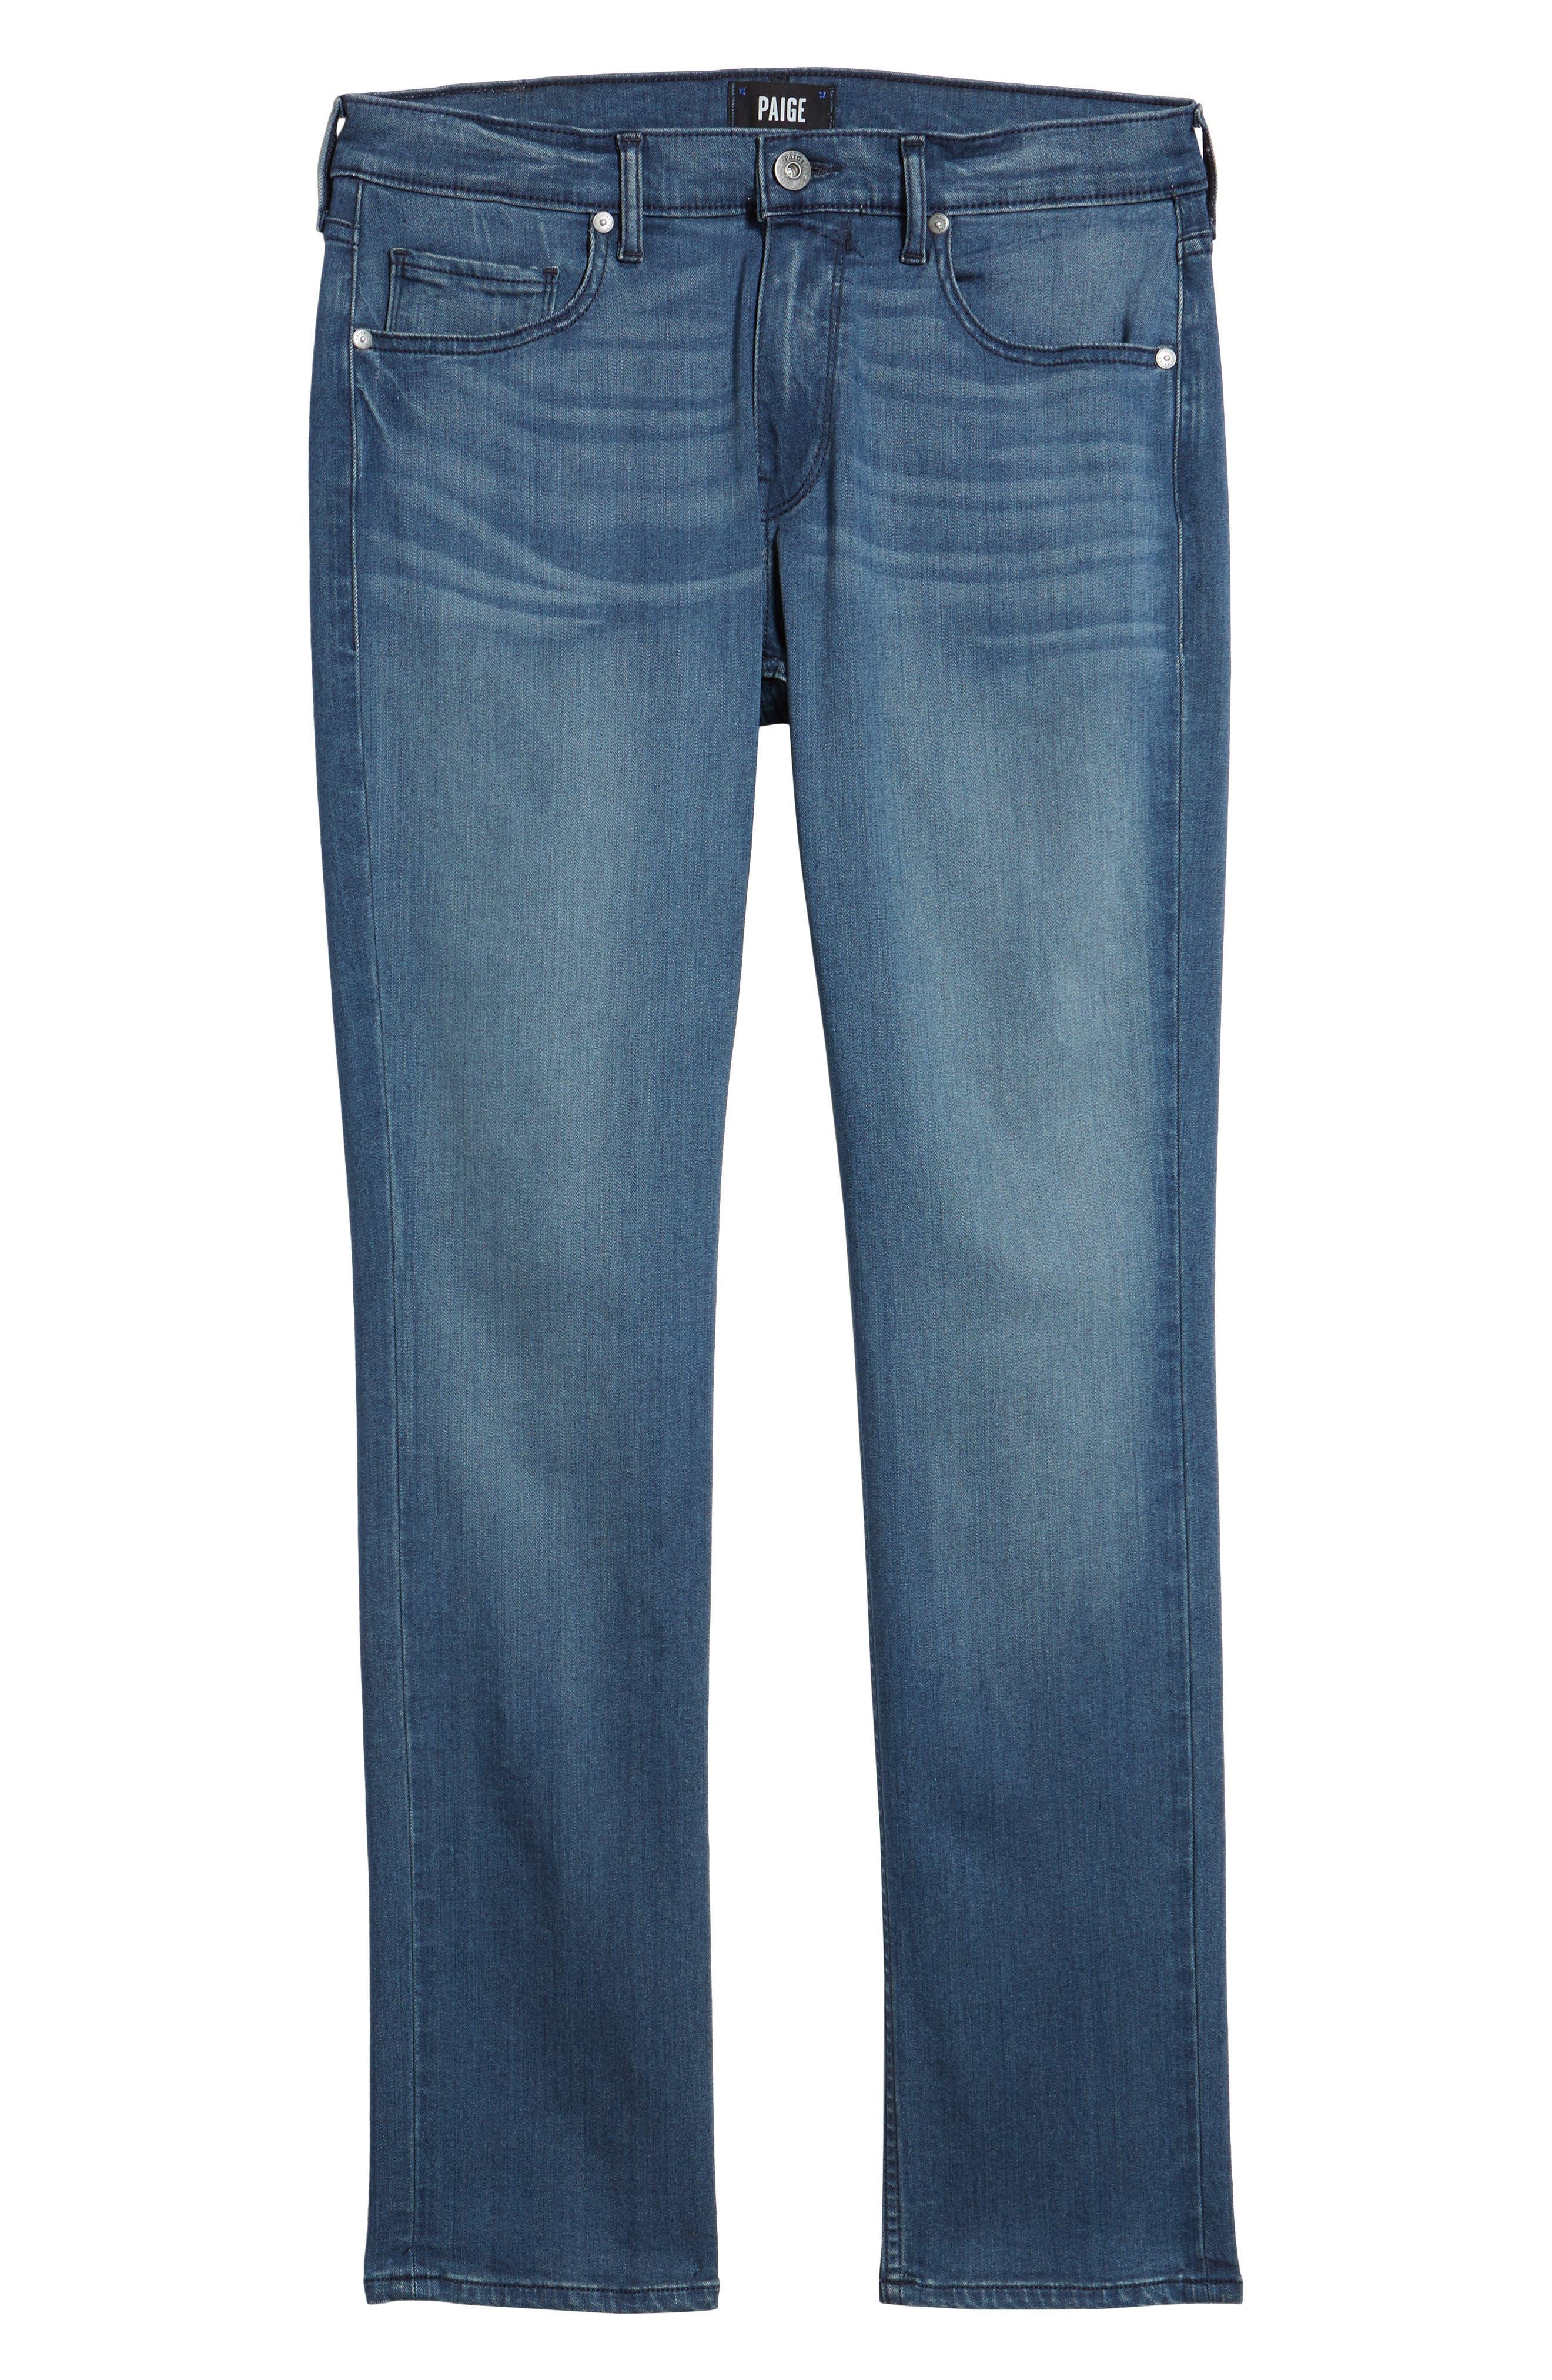 Transcend - Federal Slim Straight Fit Jeans,                             Alternate thumbnail 6, color,                             Skyler